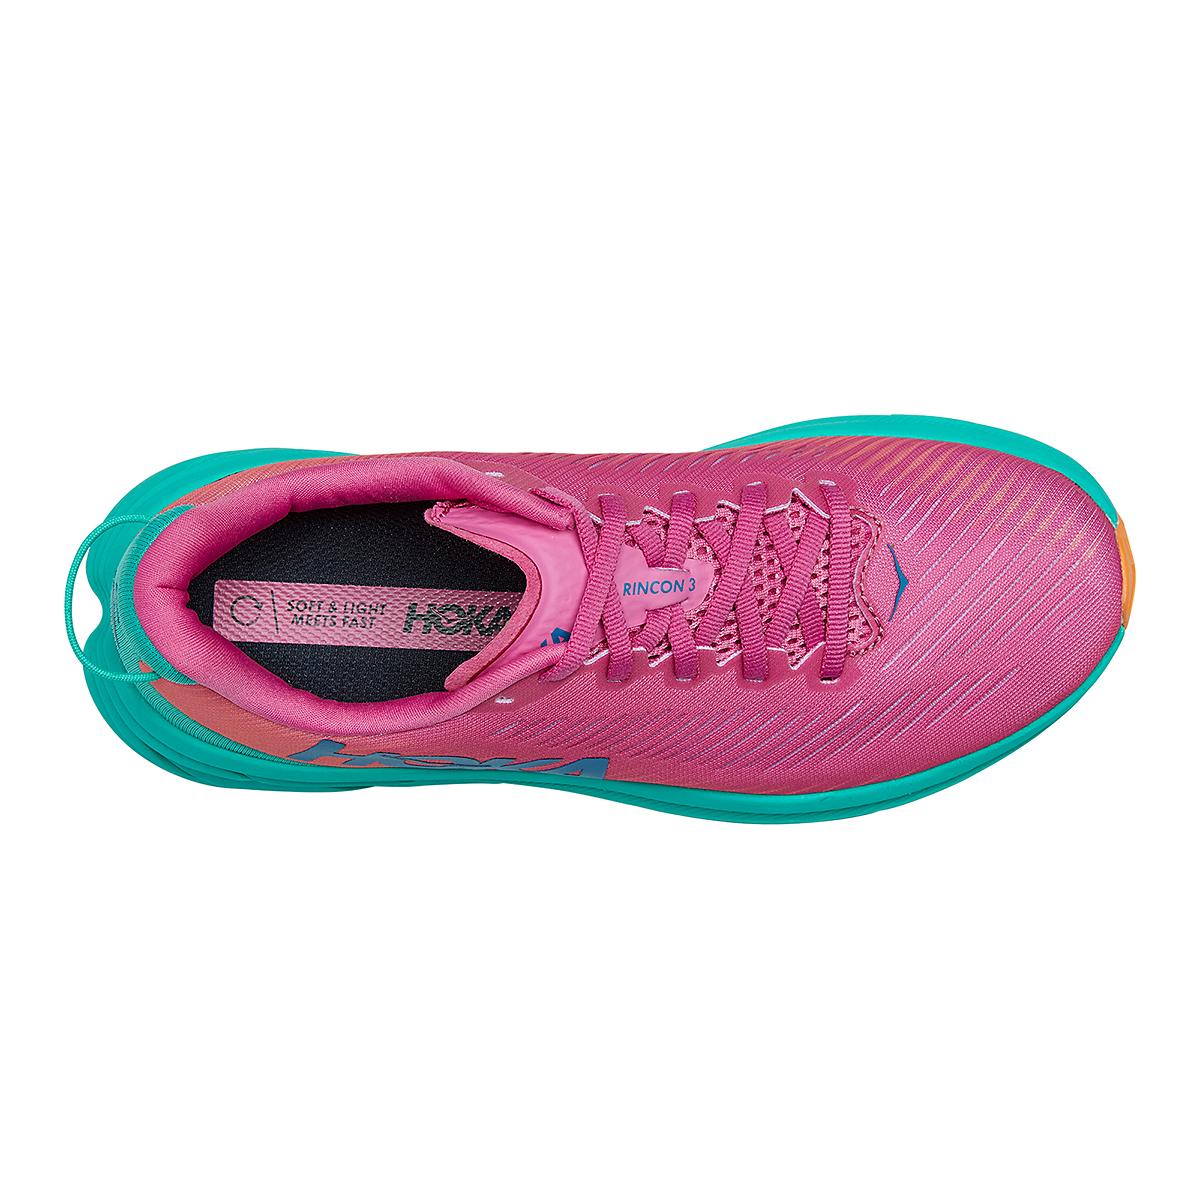 Women's Hoka One One Rincon 3 Running Shoe - Color: Phlox Pink/Atlantis - Size: 5 - Width: Regular, Phlox Pink/Atlantis, large, image 5